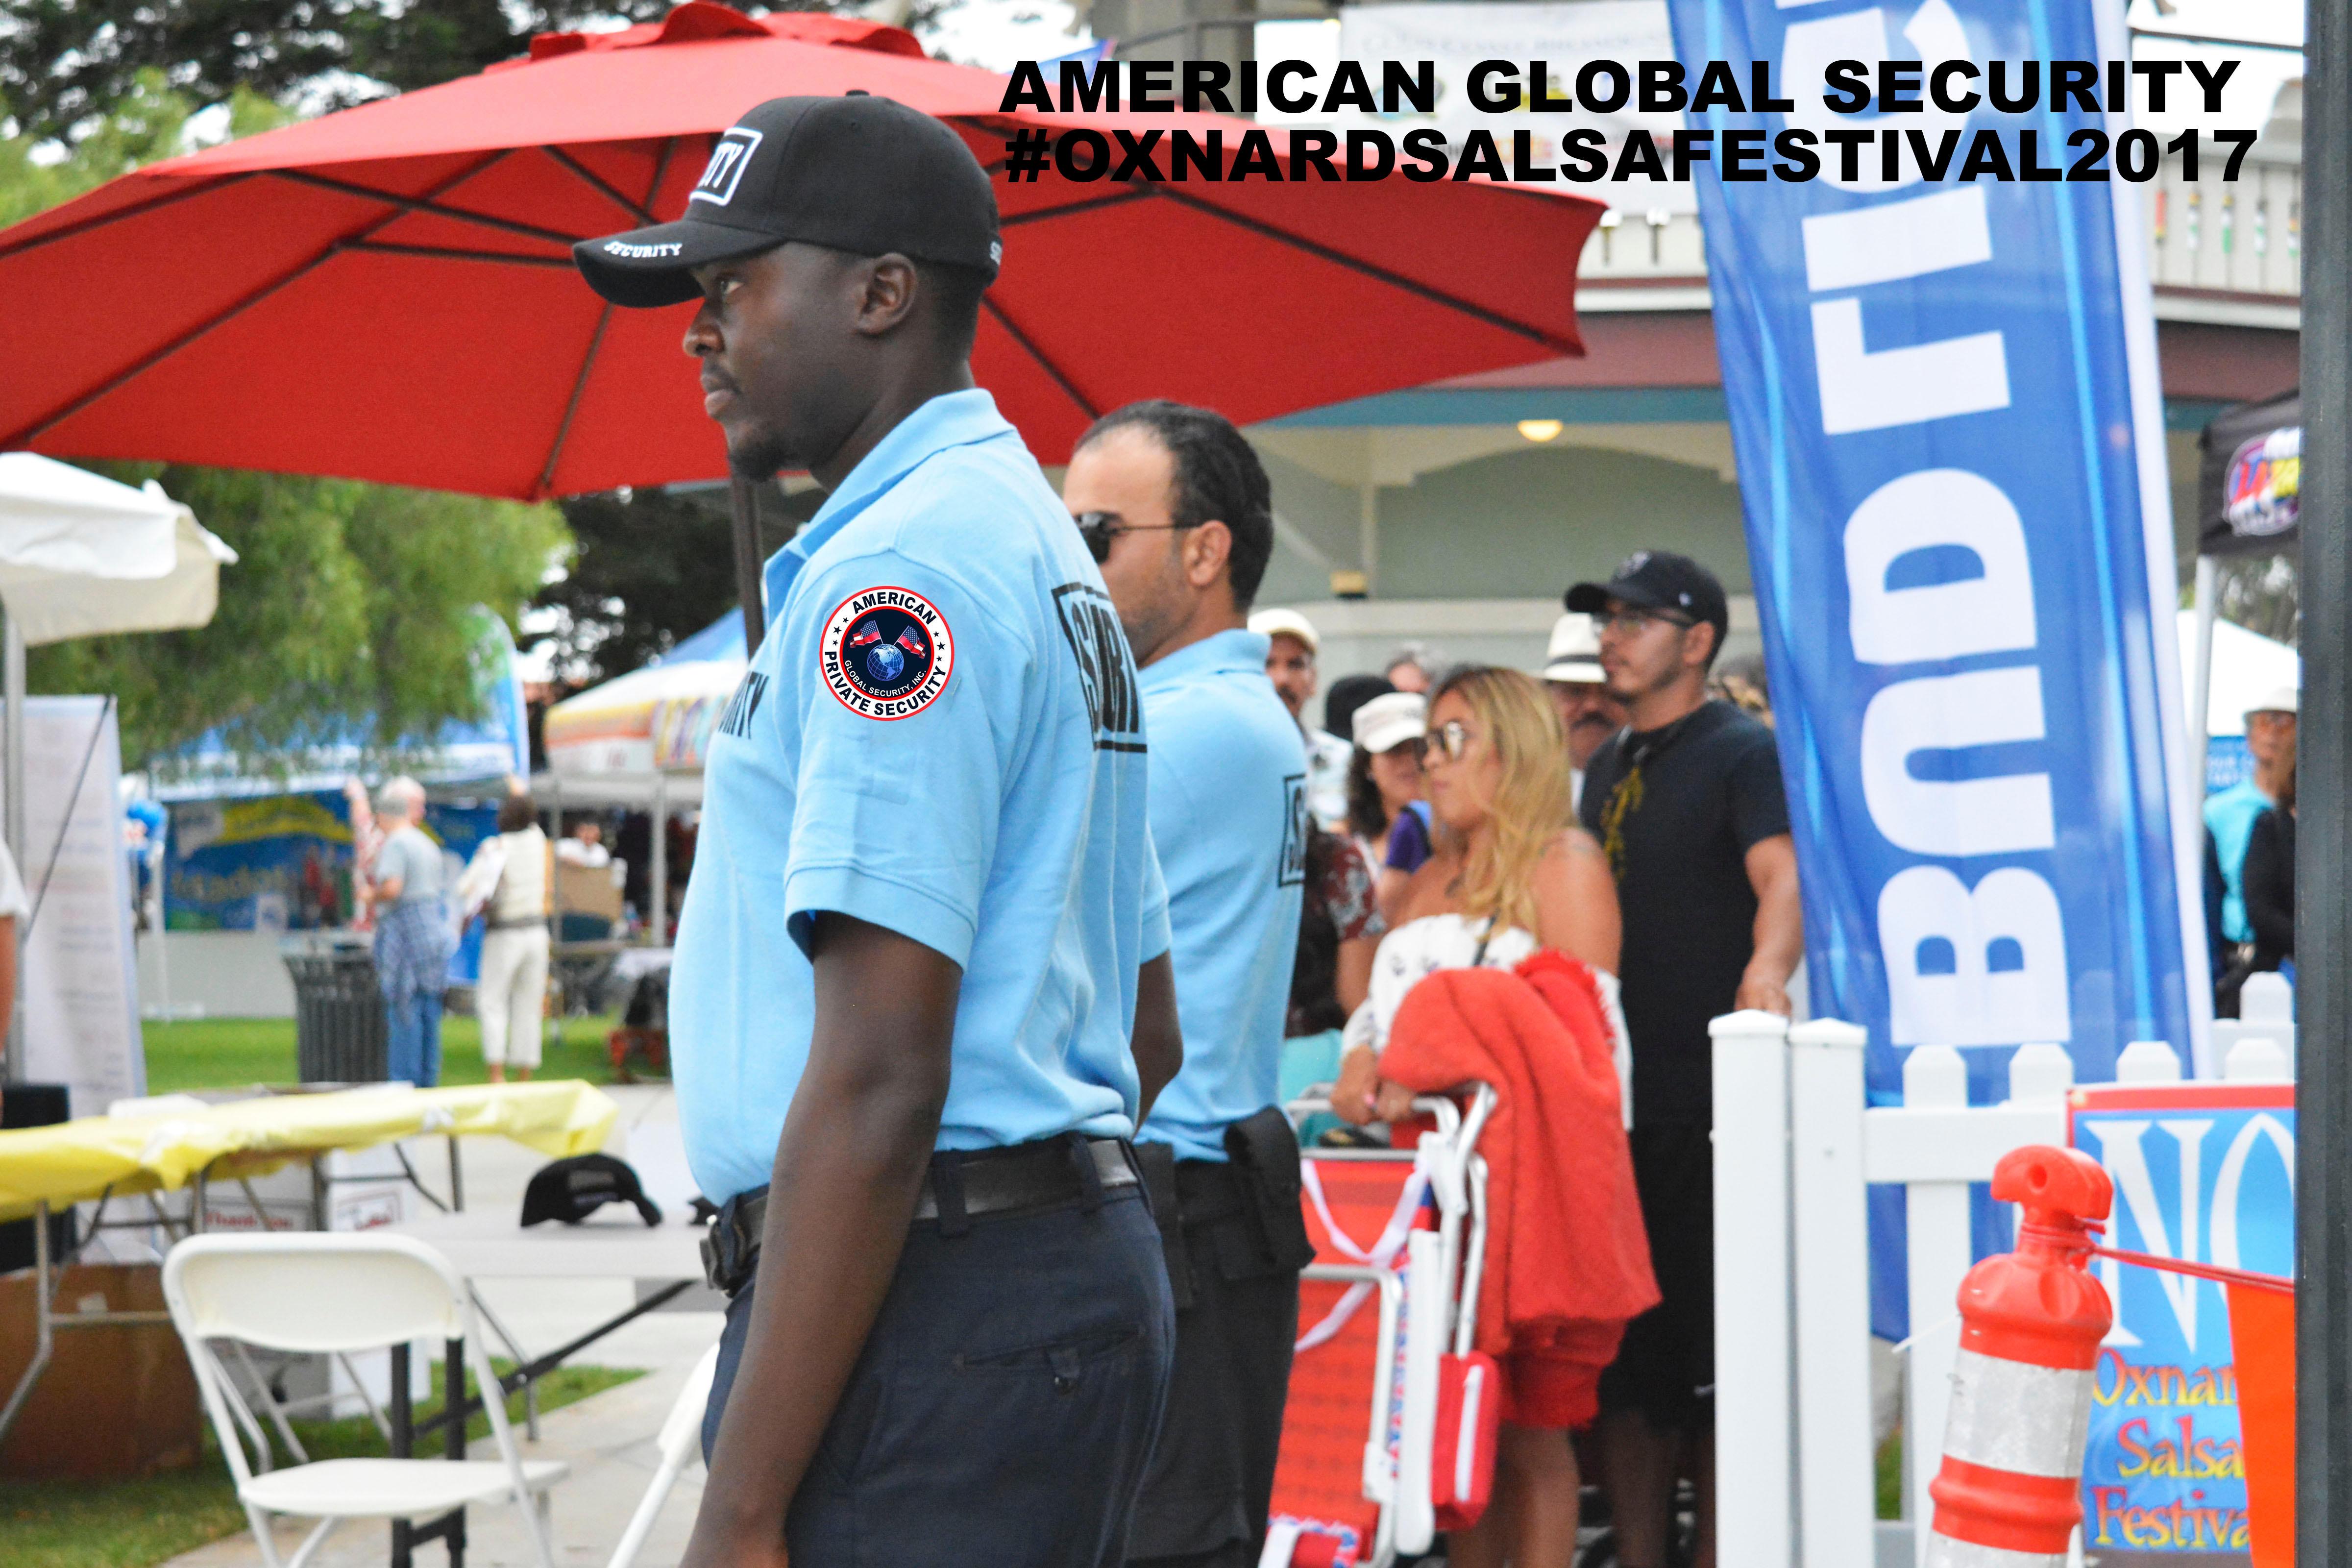 American Global Security